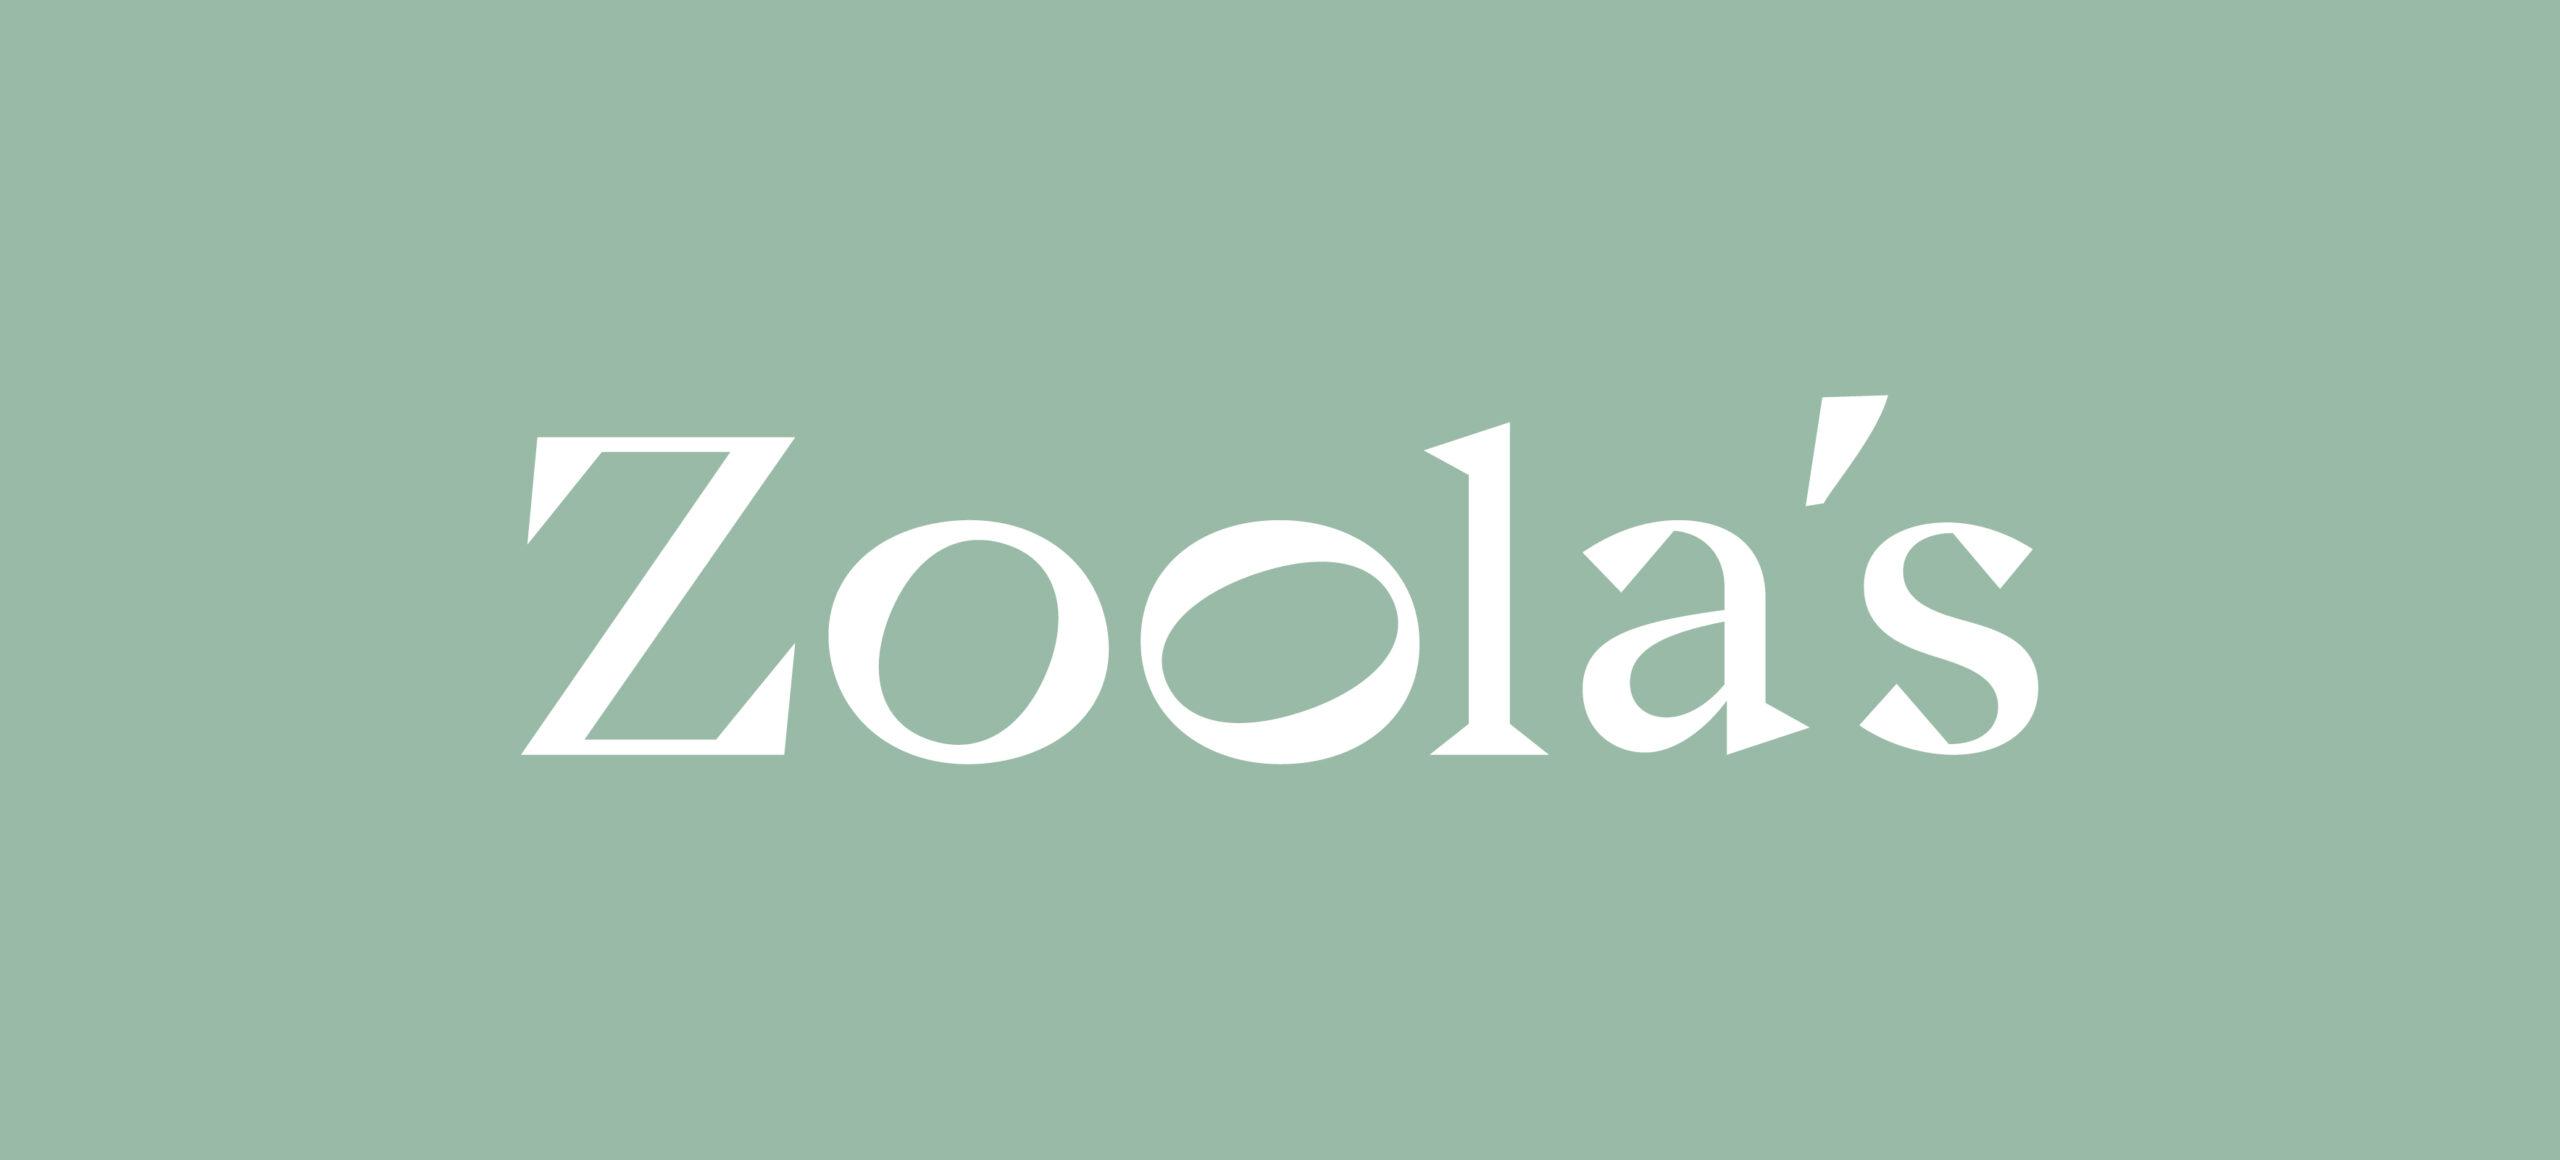 Artboard-11-copy-6-Zoolas